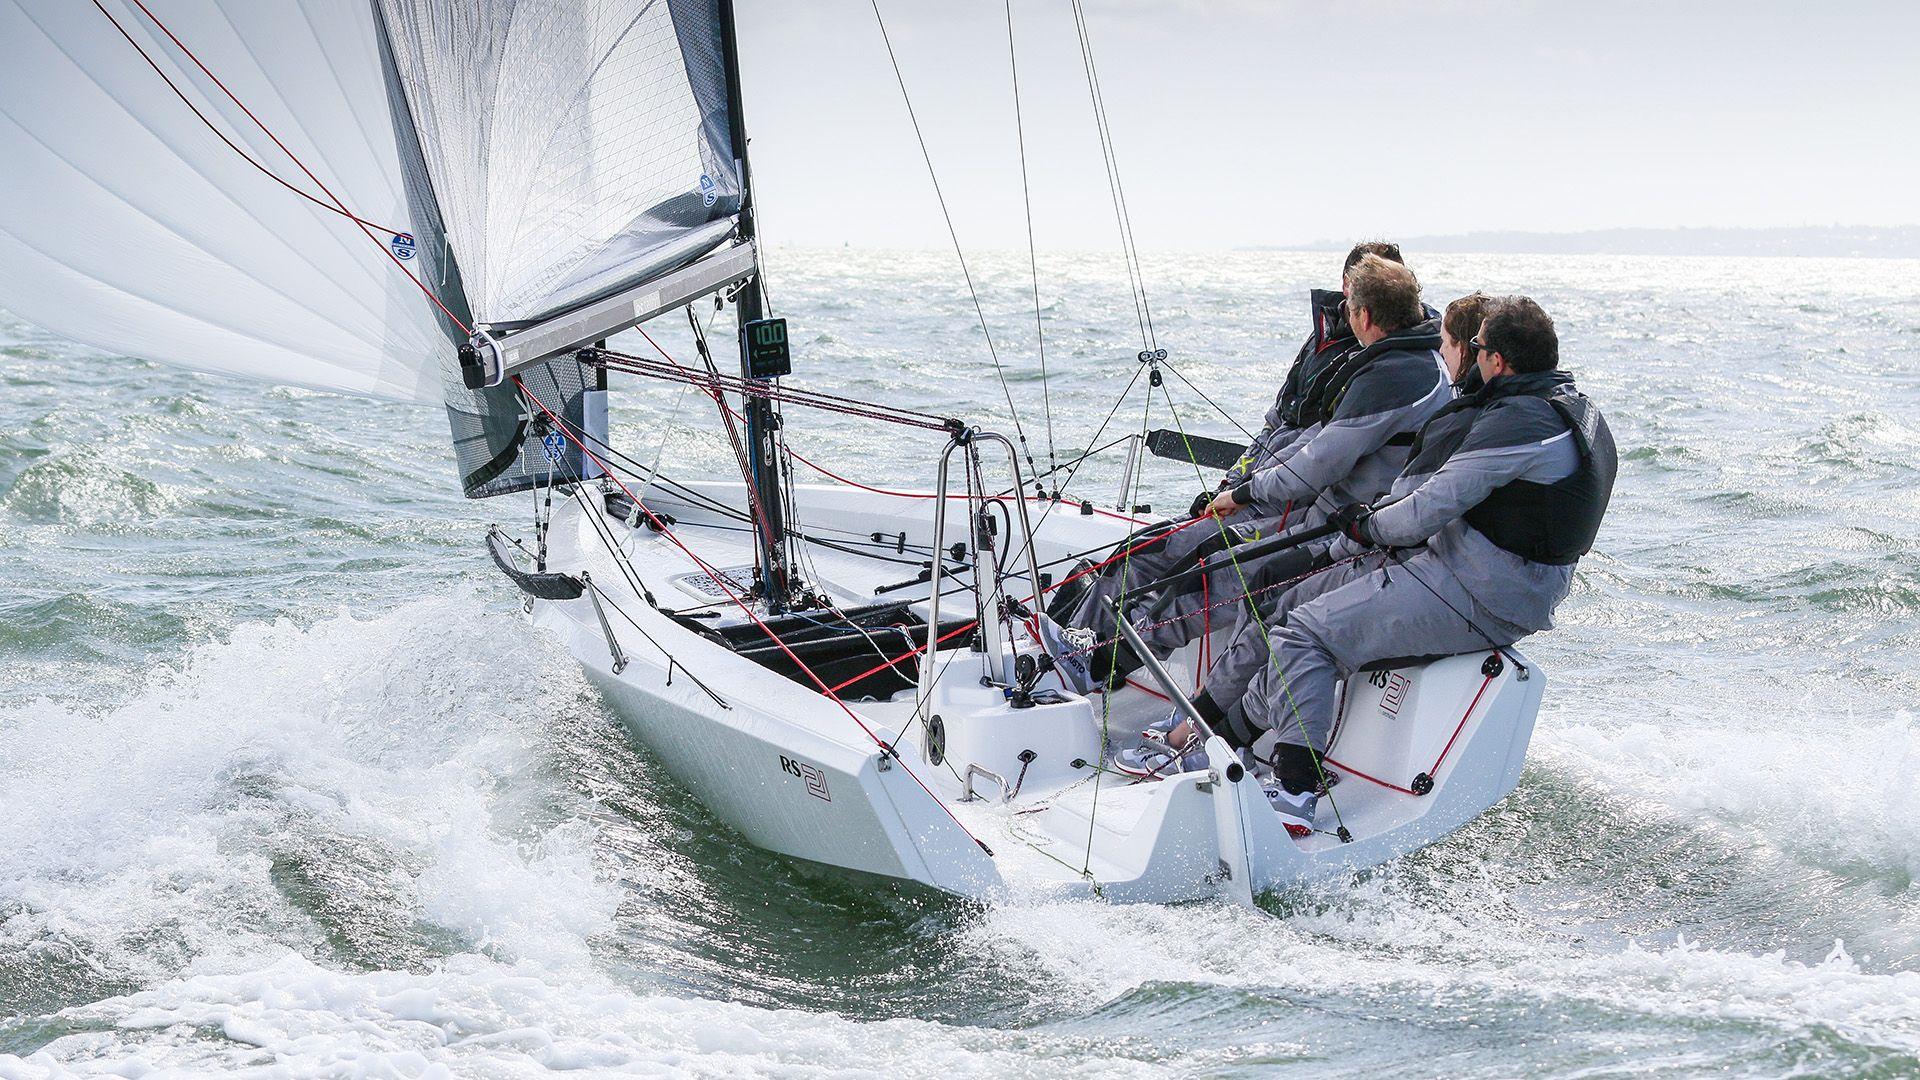 progressive keelboat solution for club programs and sailor teams